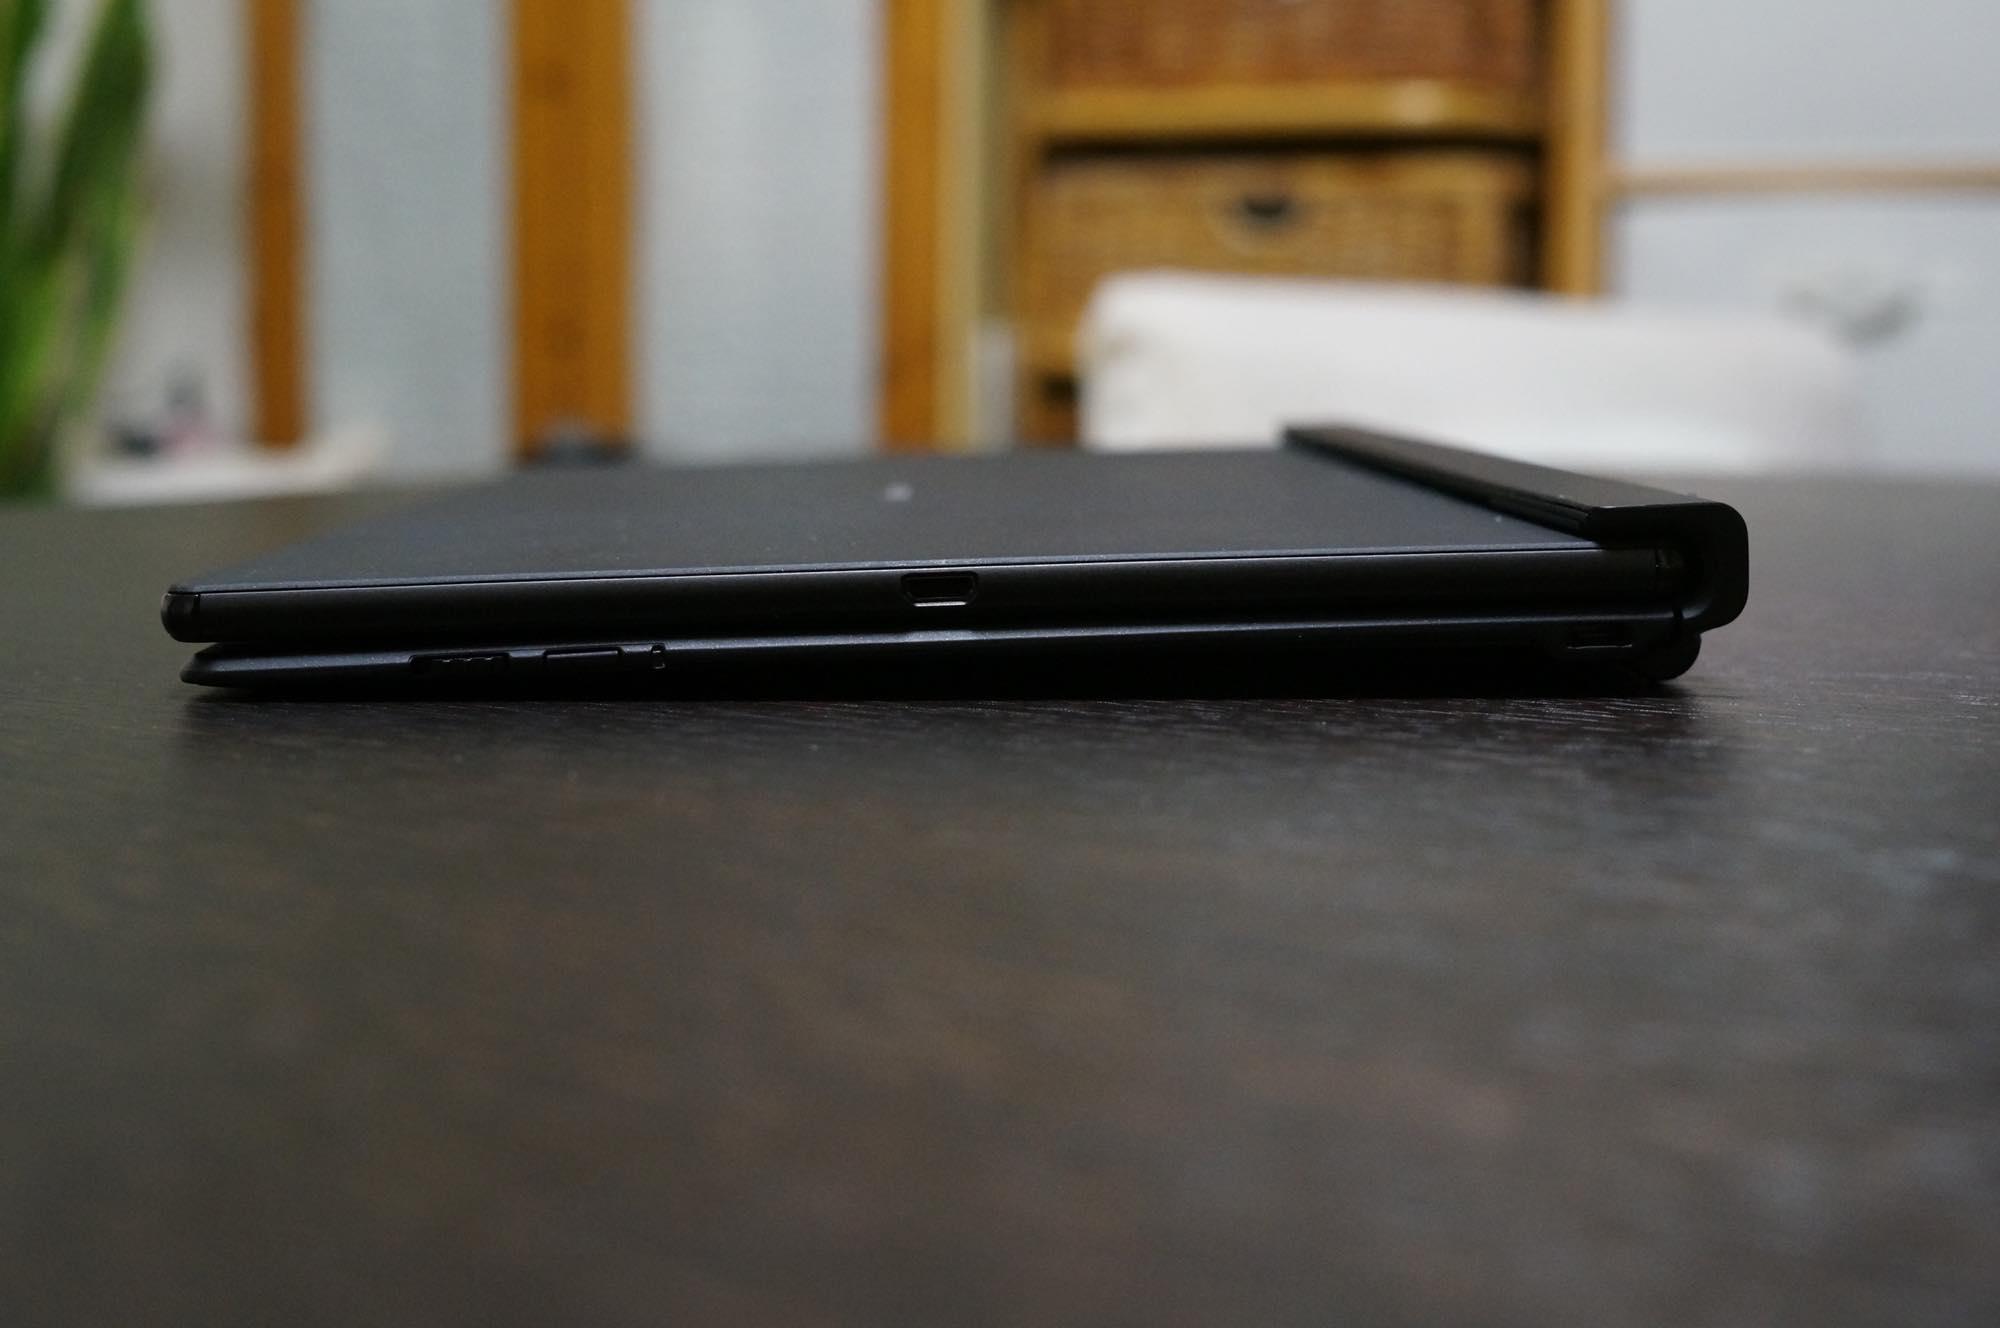 Xperia-Z4-tablet-keyboard2